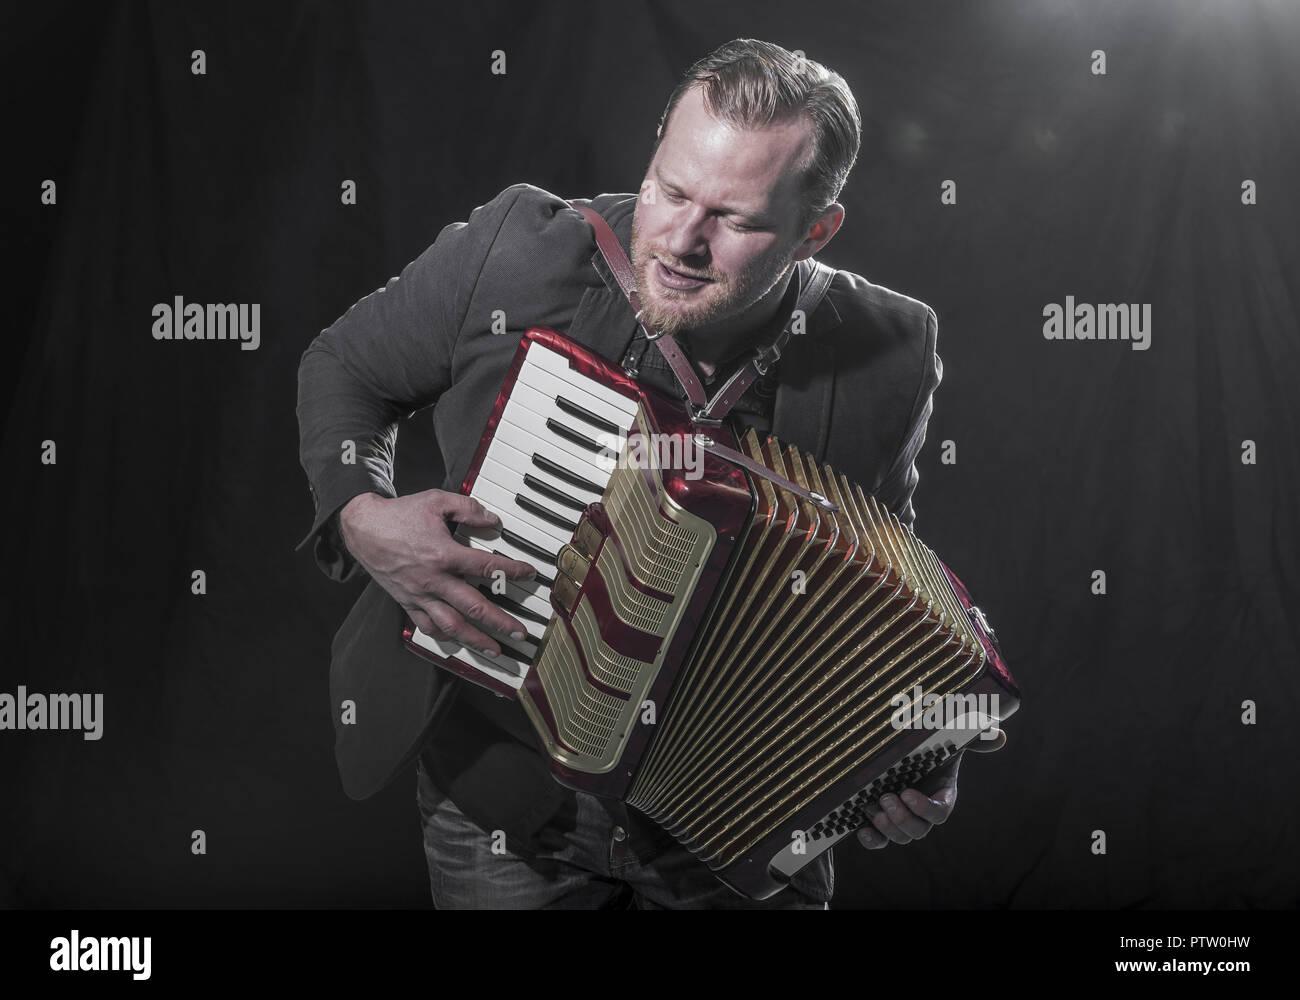 Musiker Spielt Auf Akkordeon (Model-Release) Stockbild